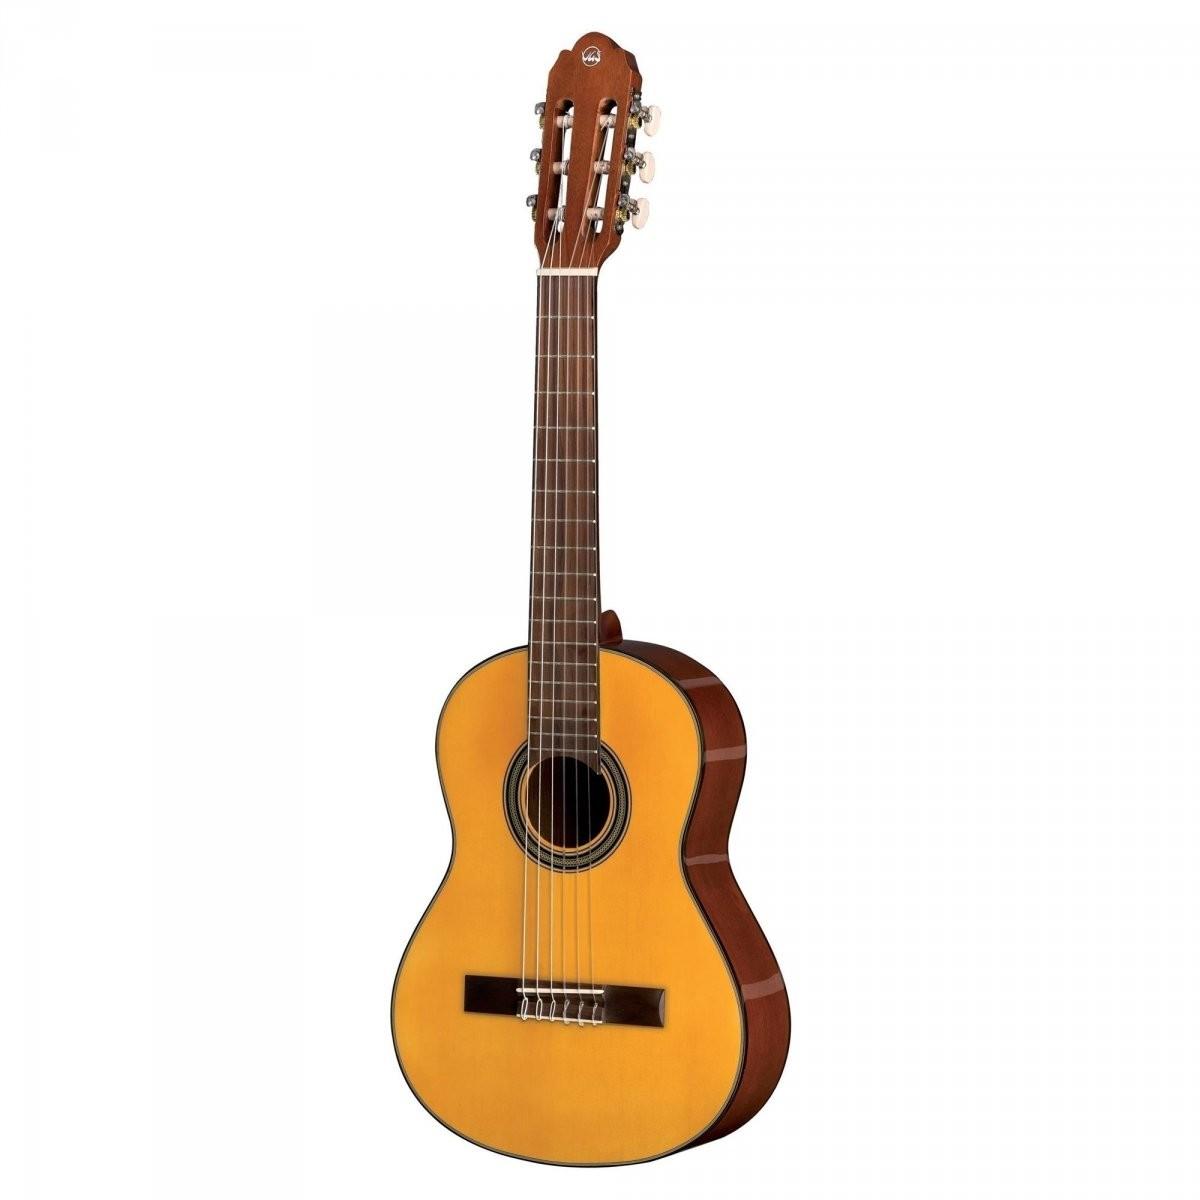 Gewa 500110 NA gitara klasyczna 1/2